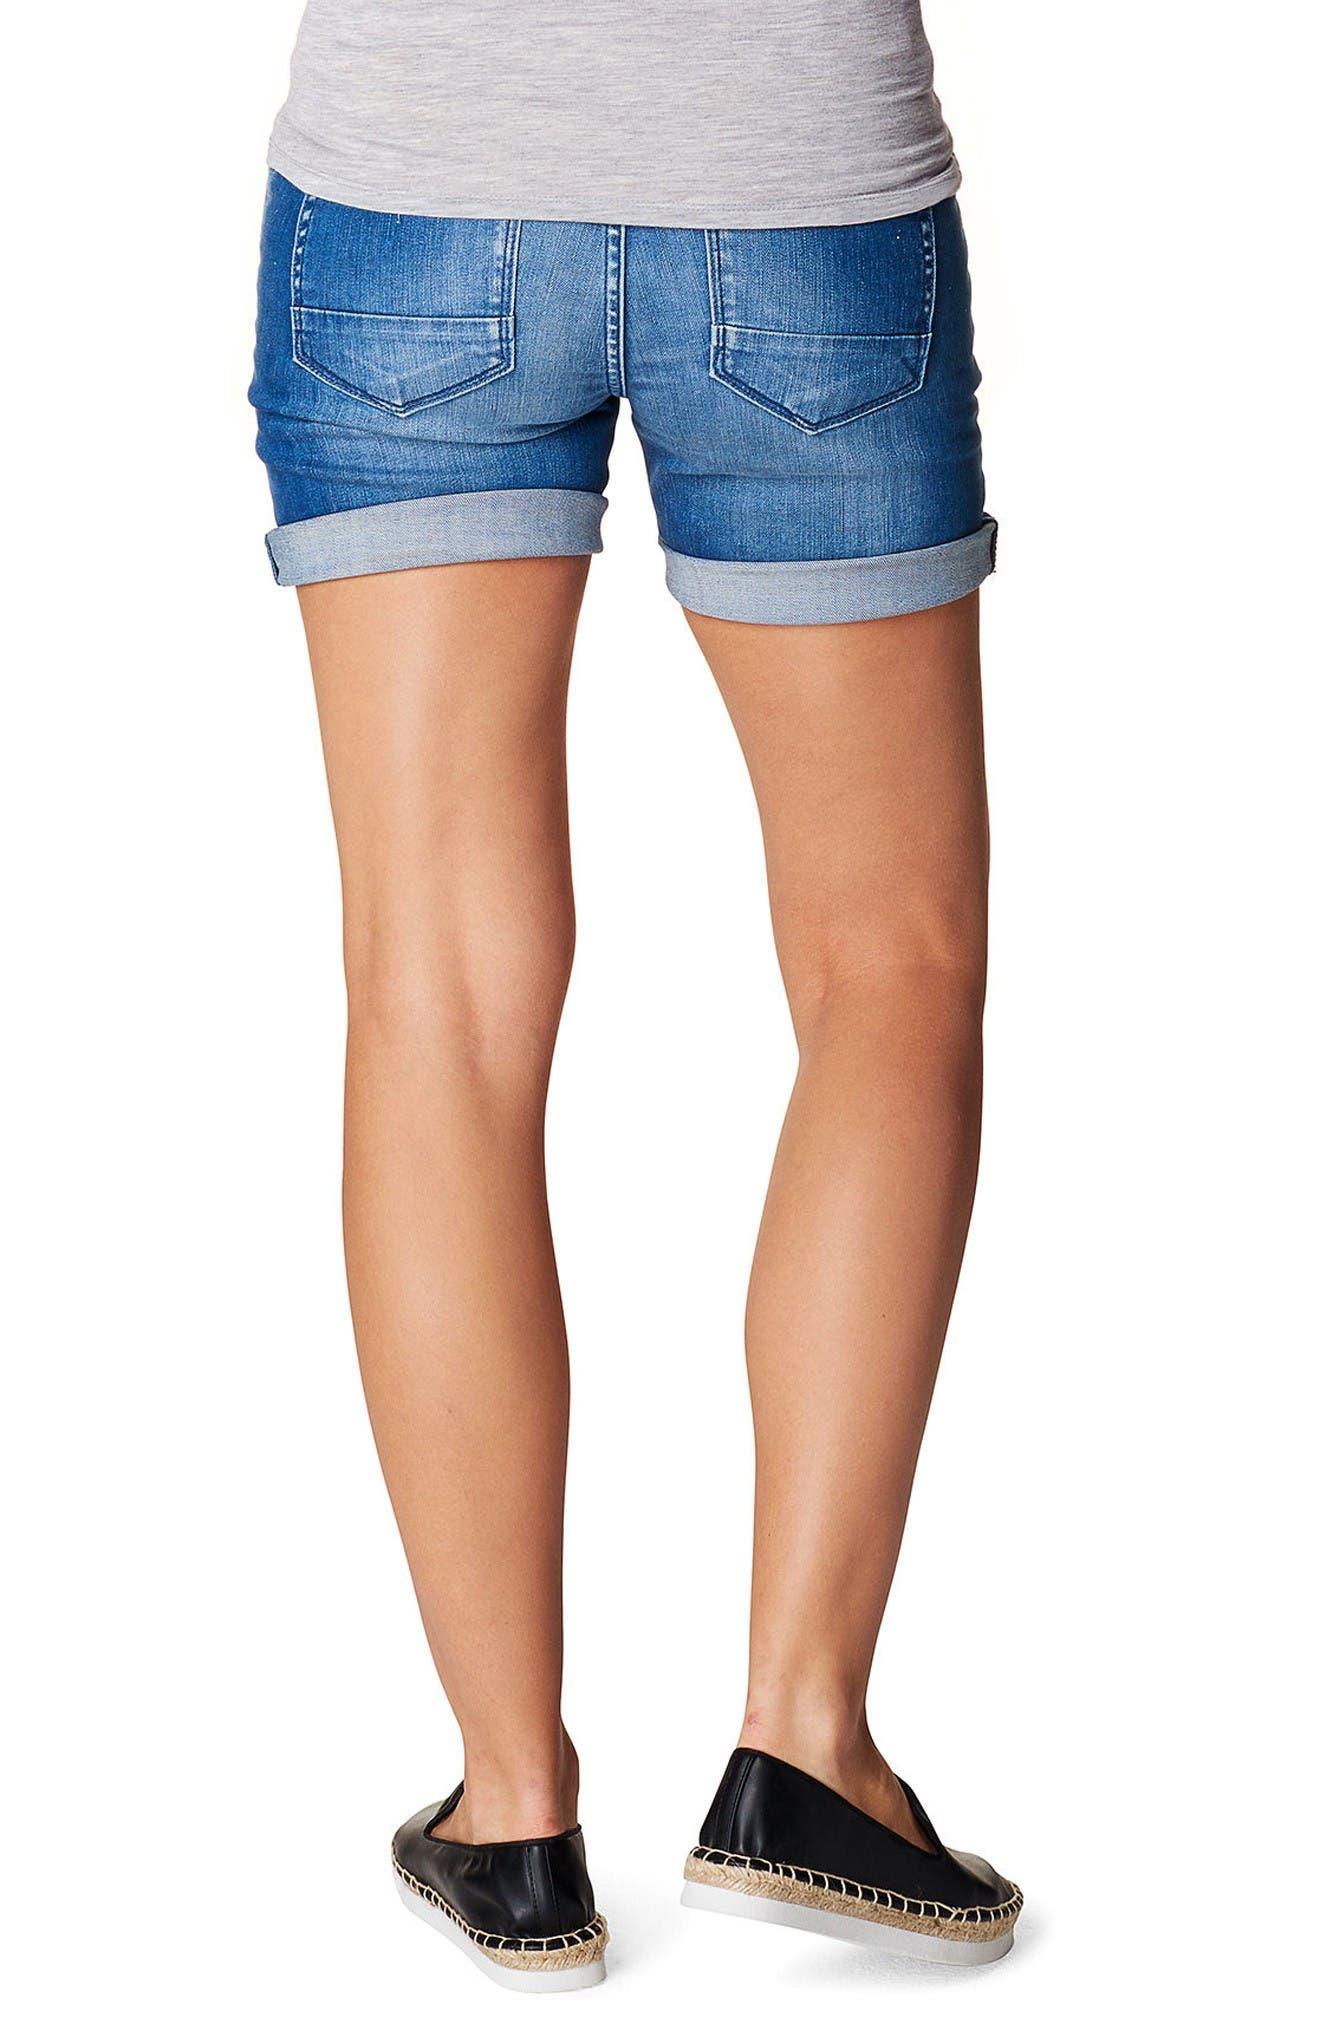 Alternate Image 2  - Noppies Zita Maternity Jean Shorts